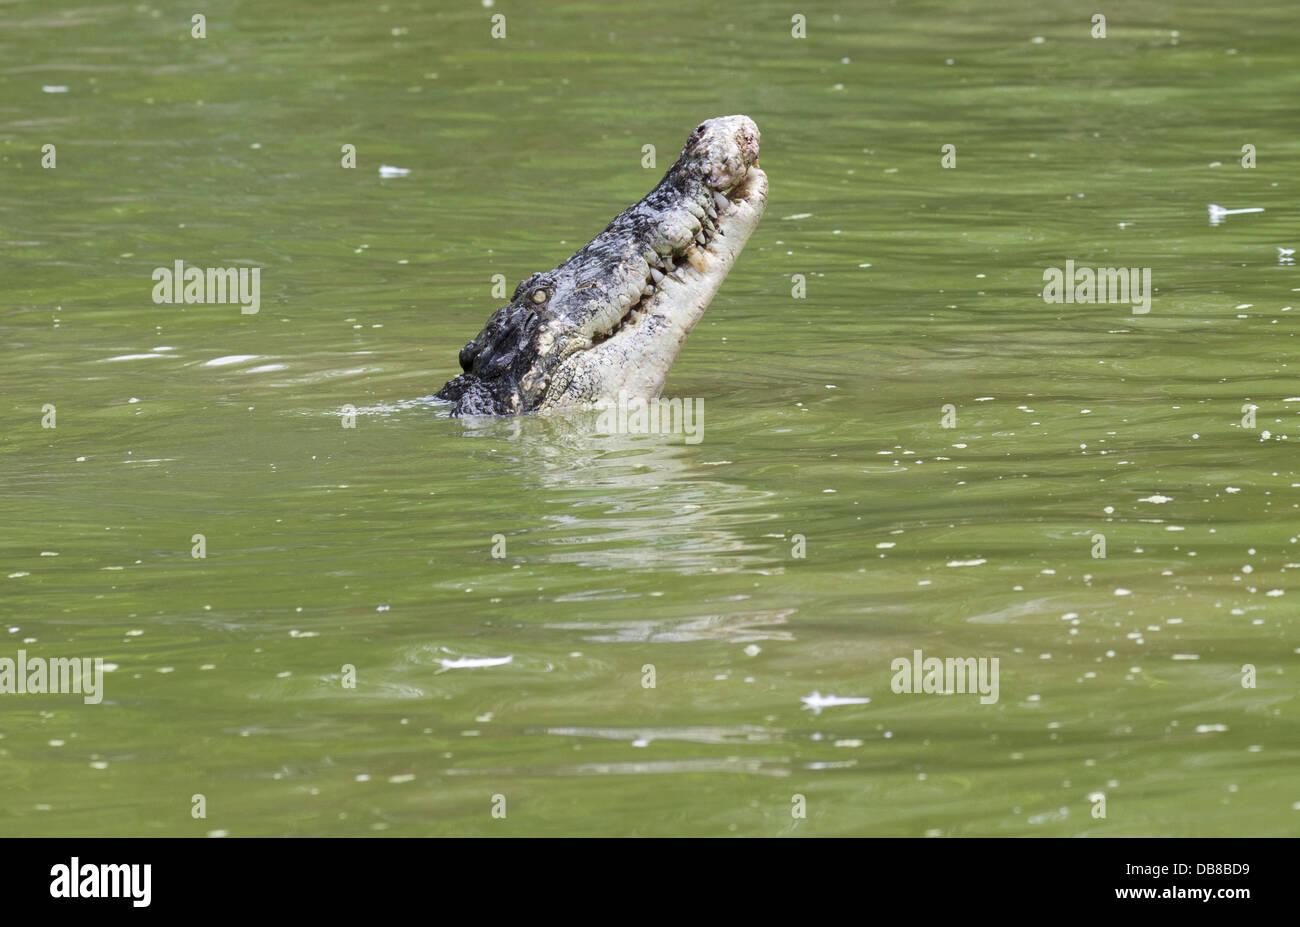 Estuarine Crocodile (Saltwater Crocodile), Crocodylus porosus, Sarawak, Malaysia - Stock Image